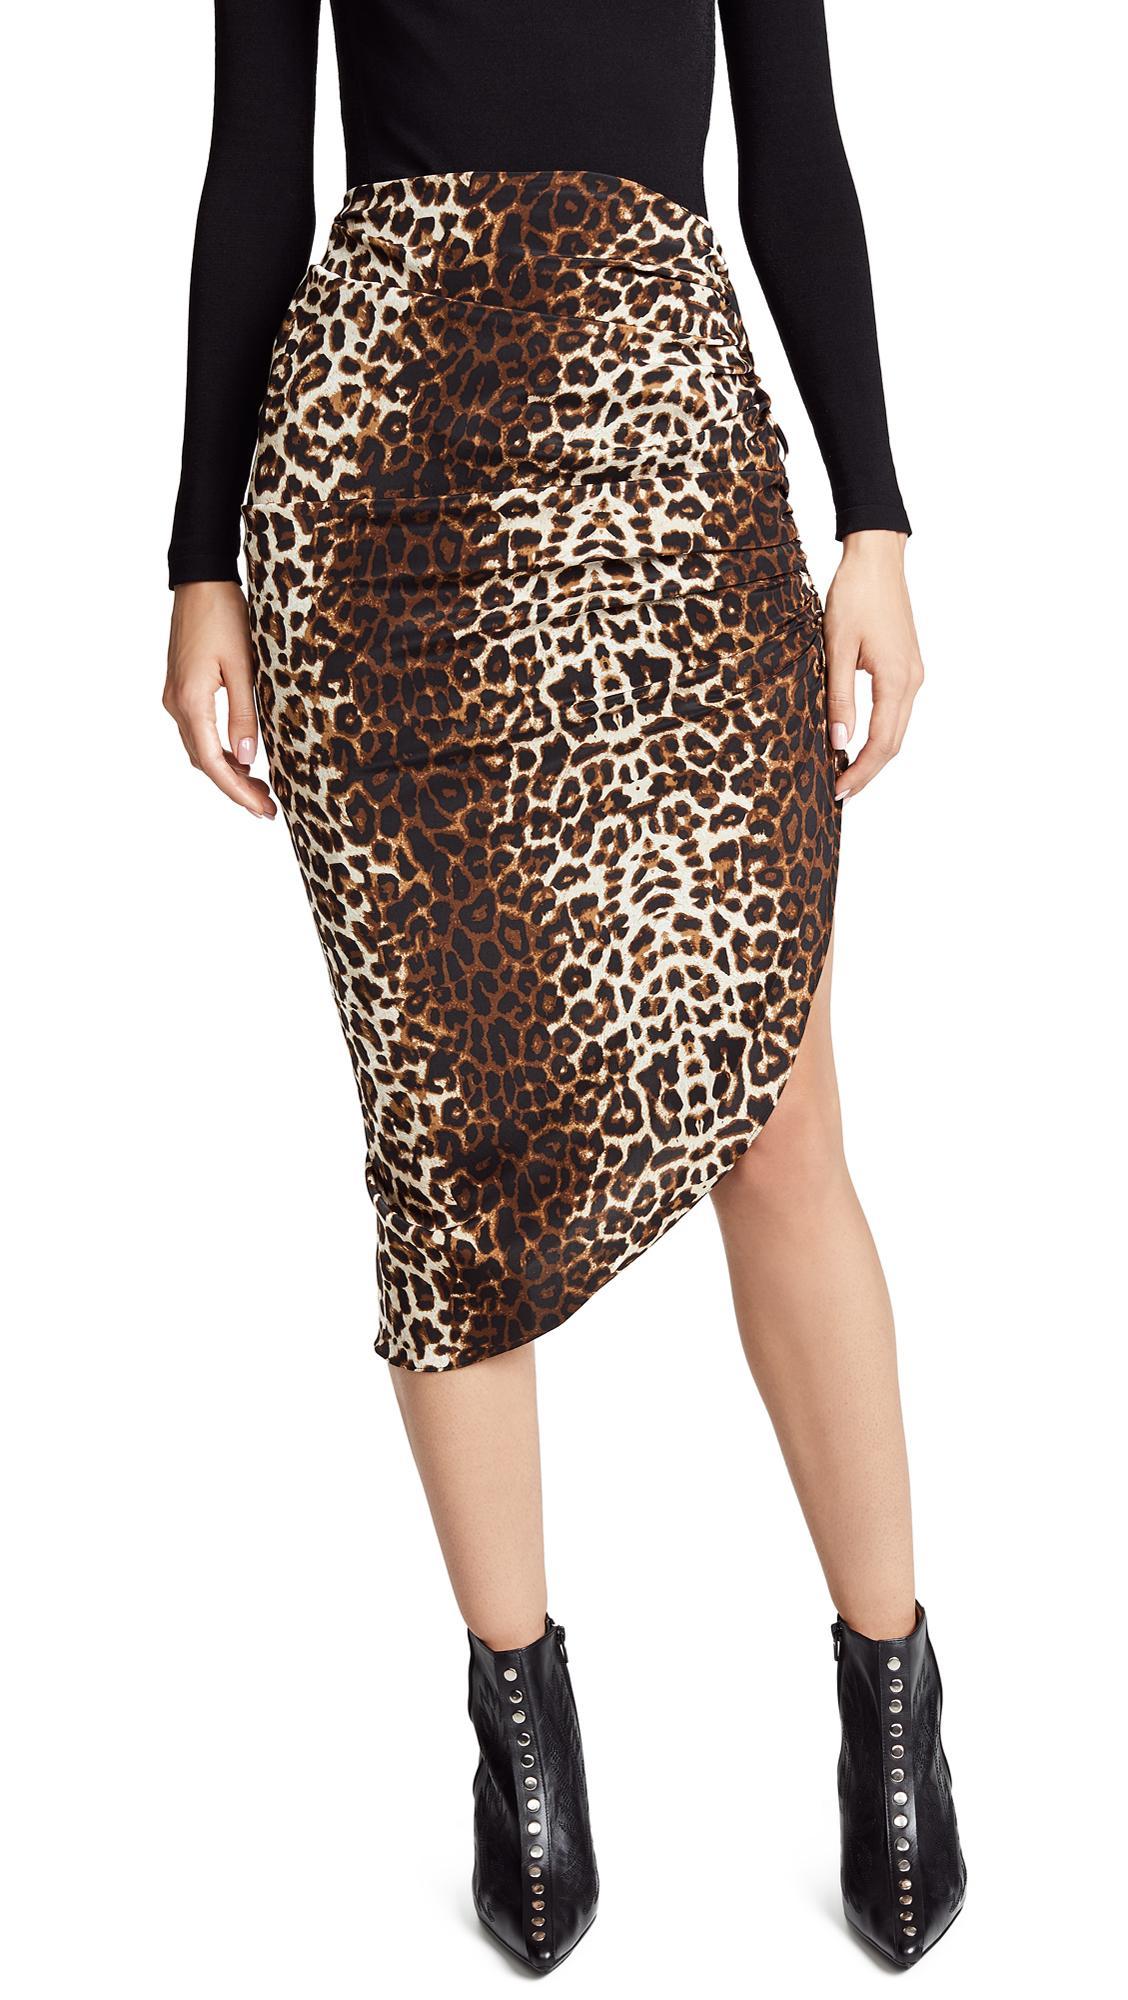 f01de0d17c97 Veronica Beard Ari Skirt In Nude/Brown | ModeSens